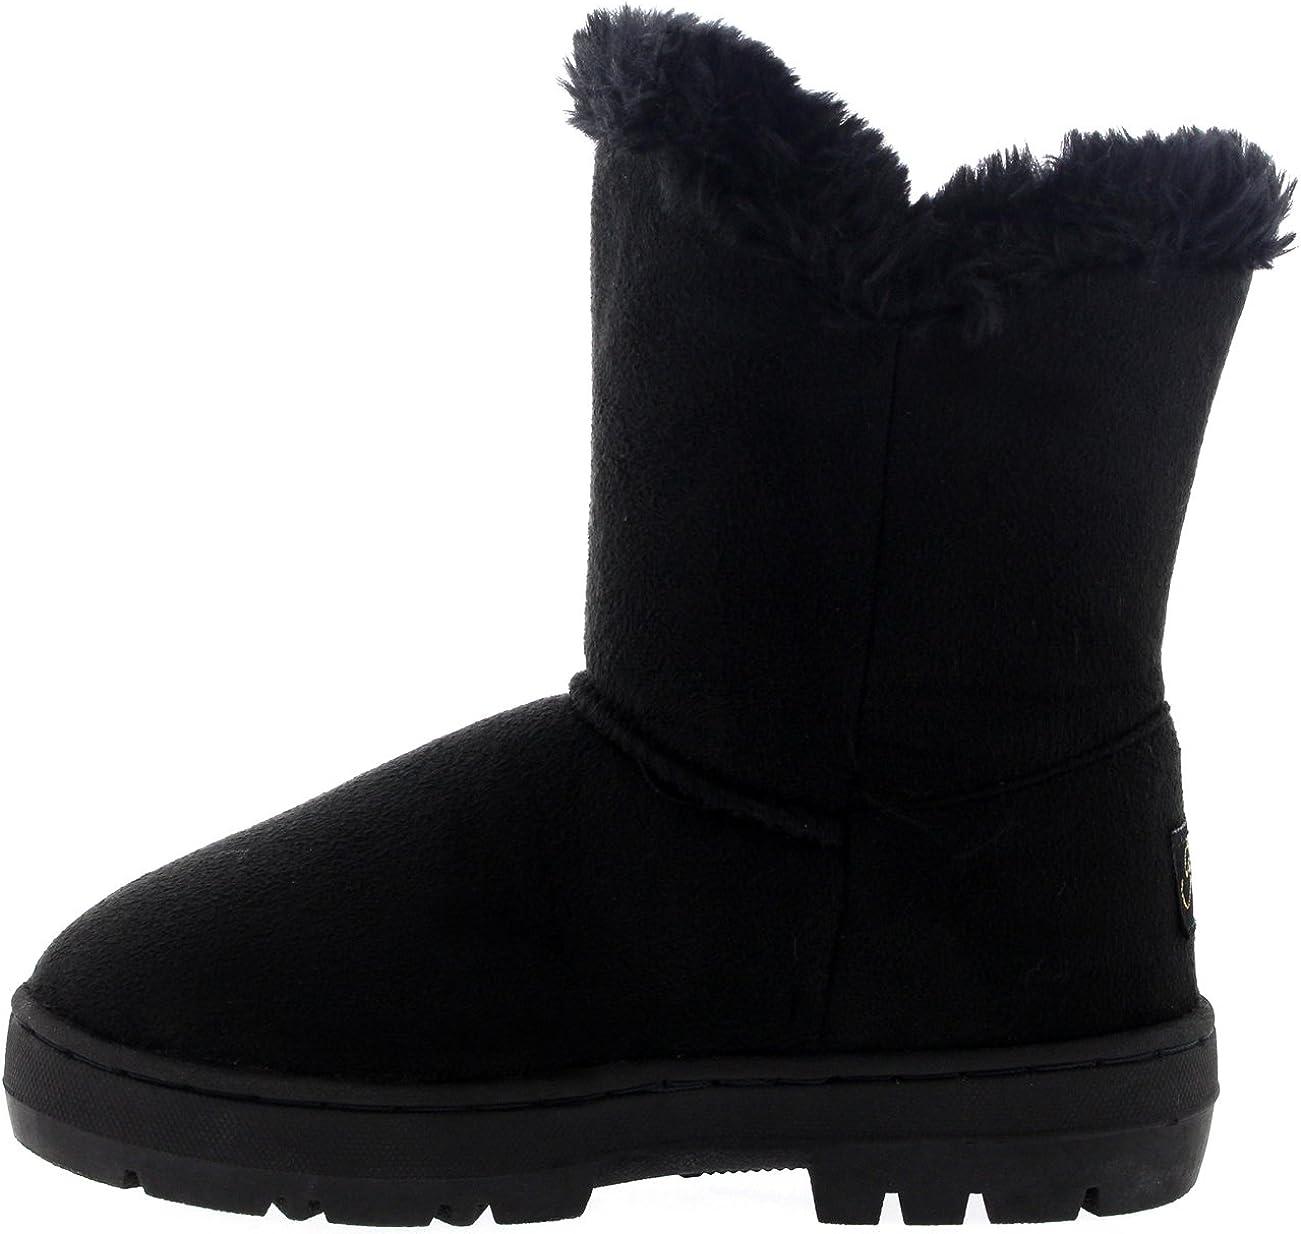 Kids Girls Button Winter Snow Rain Cosy Casual Warm Boots